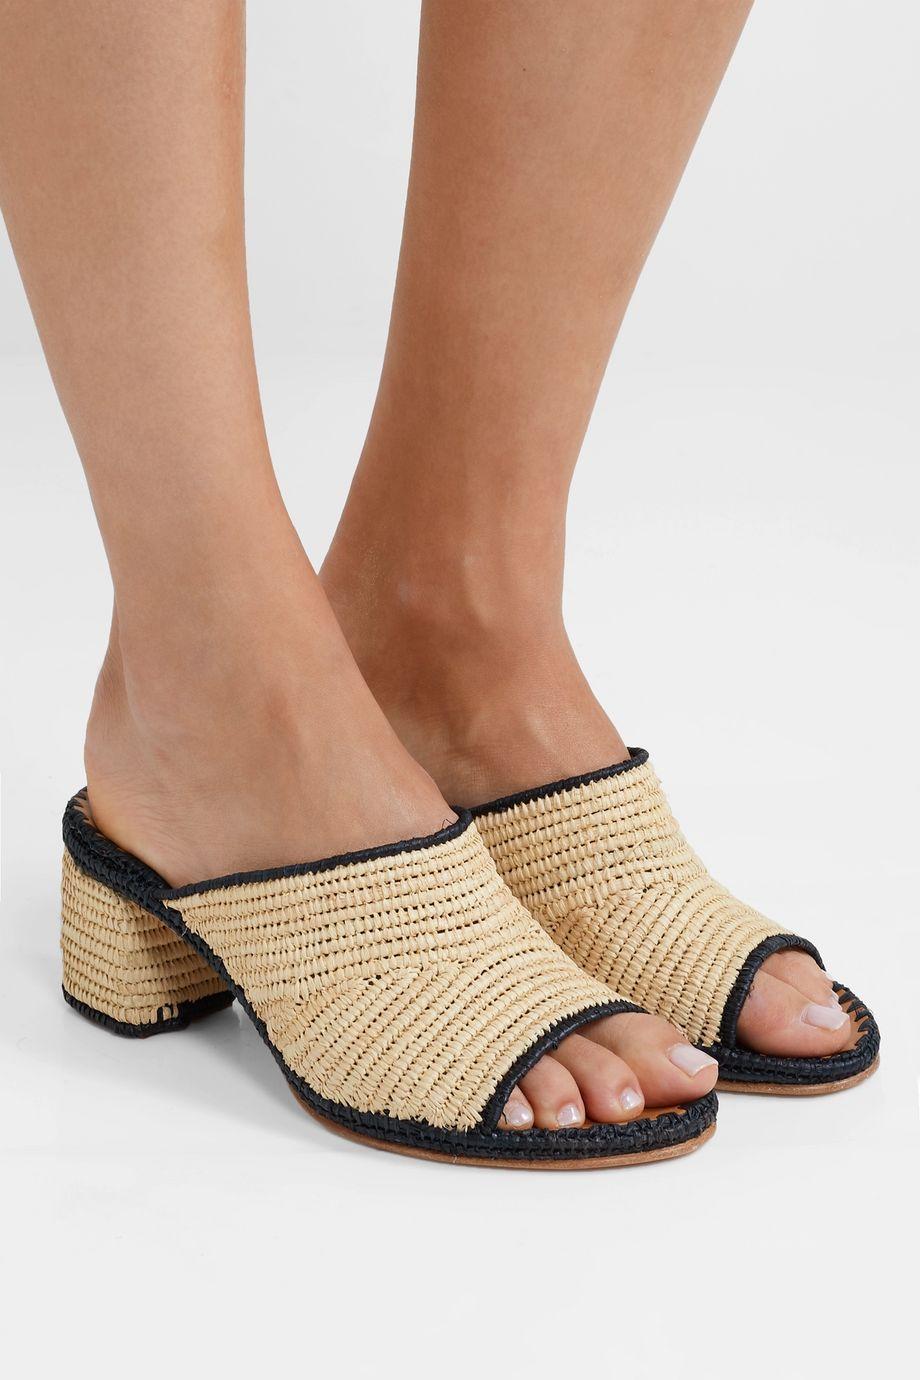 Carrie Forbes Rama 双色编织拉菲草穆勒鞋